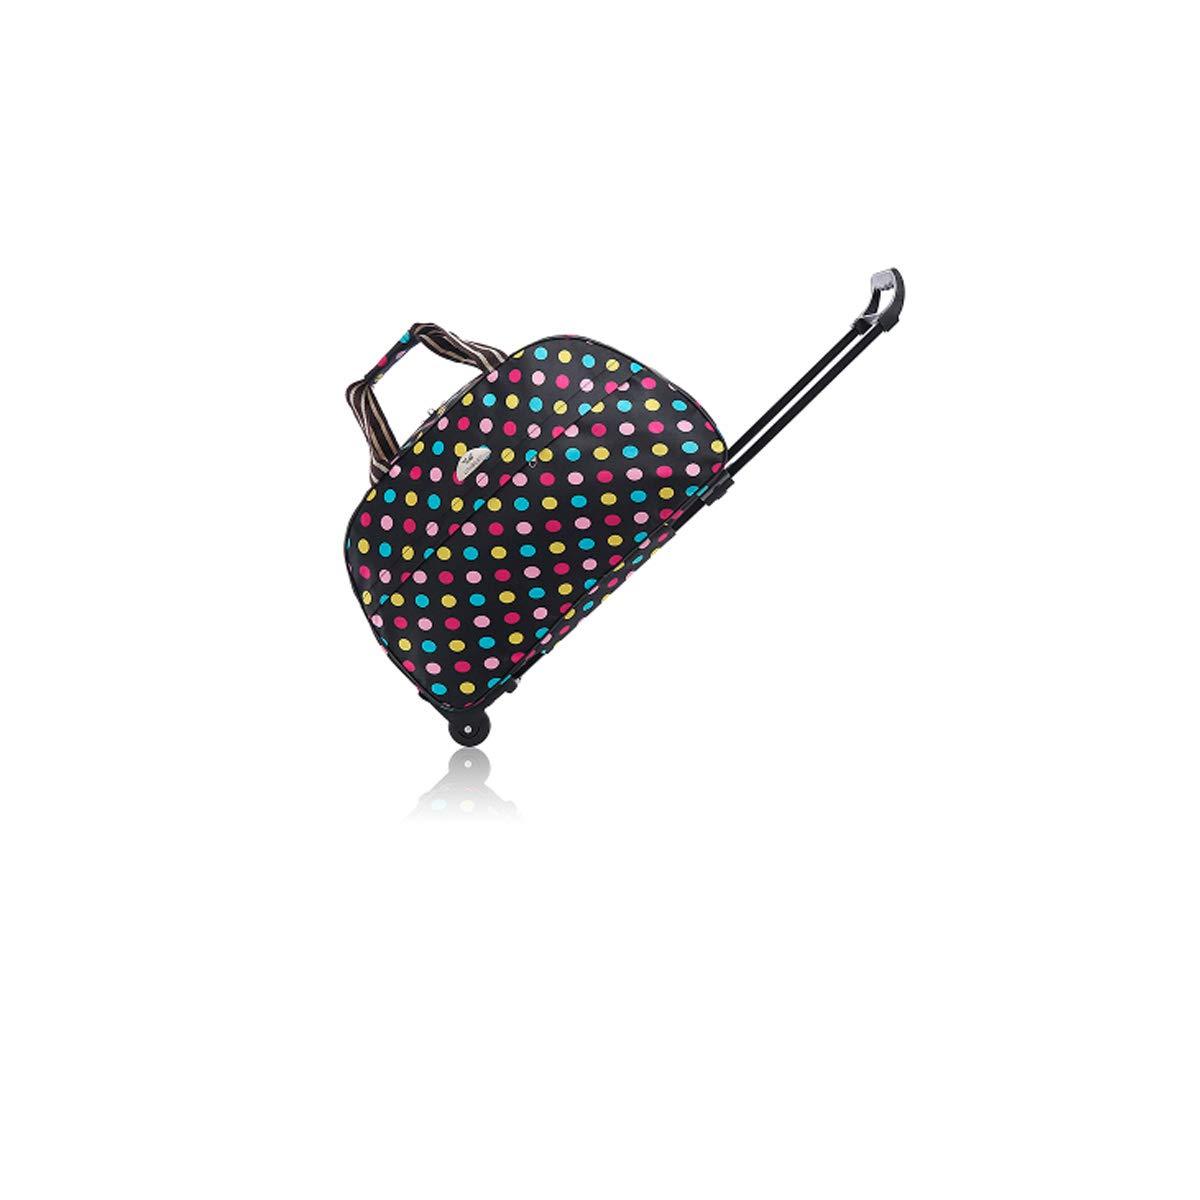 20 inches Color : Colored dots, Size : 20 Soft Bag Travel Storage Bag Travel case Suitcase,Handbag Bahaowenjuguan Trolley case